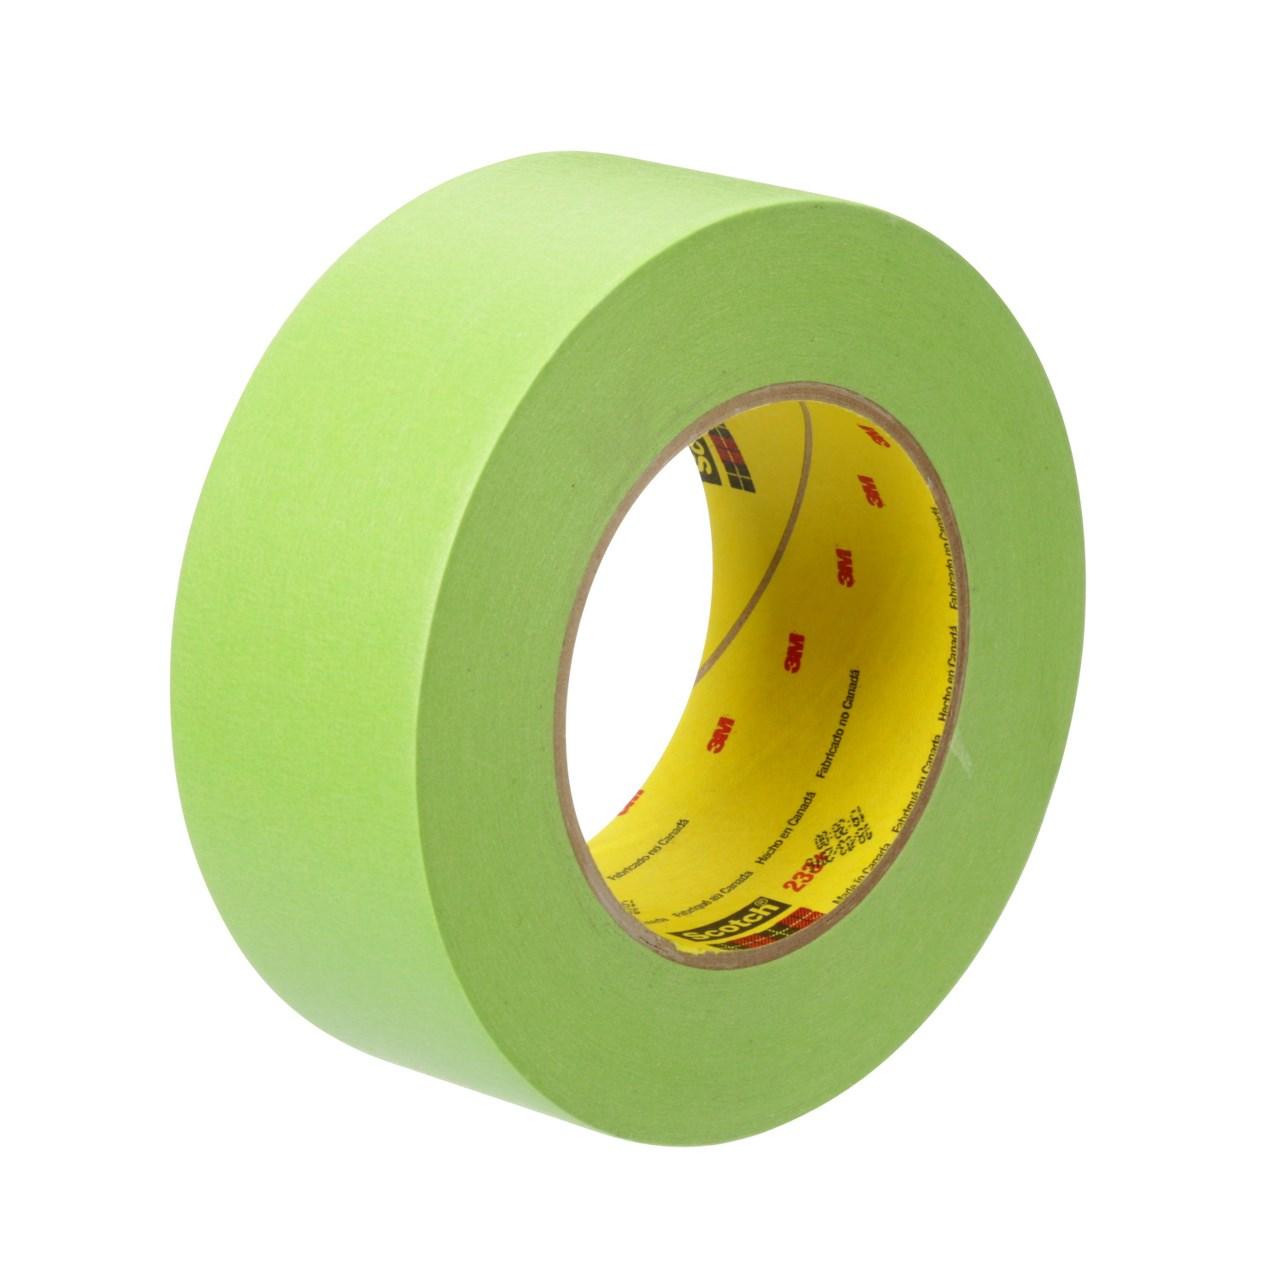 3m scotch 233 premium automotive masking tape